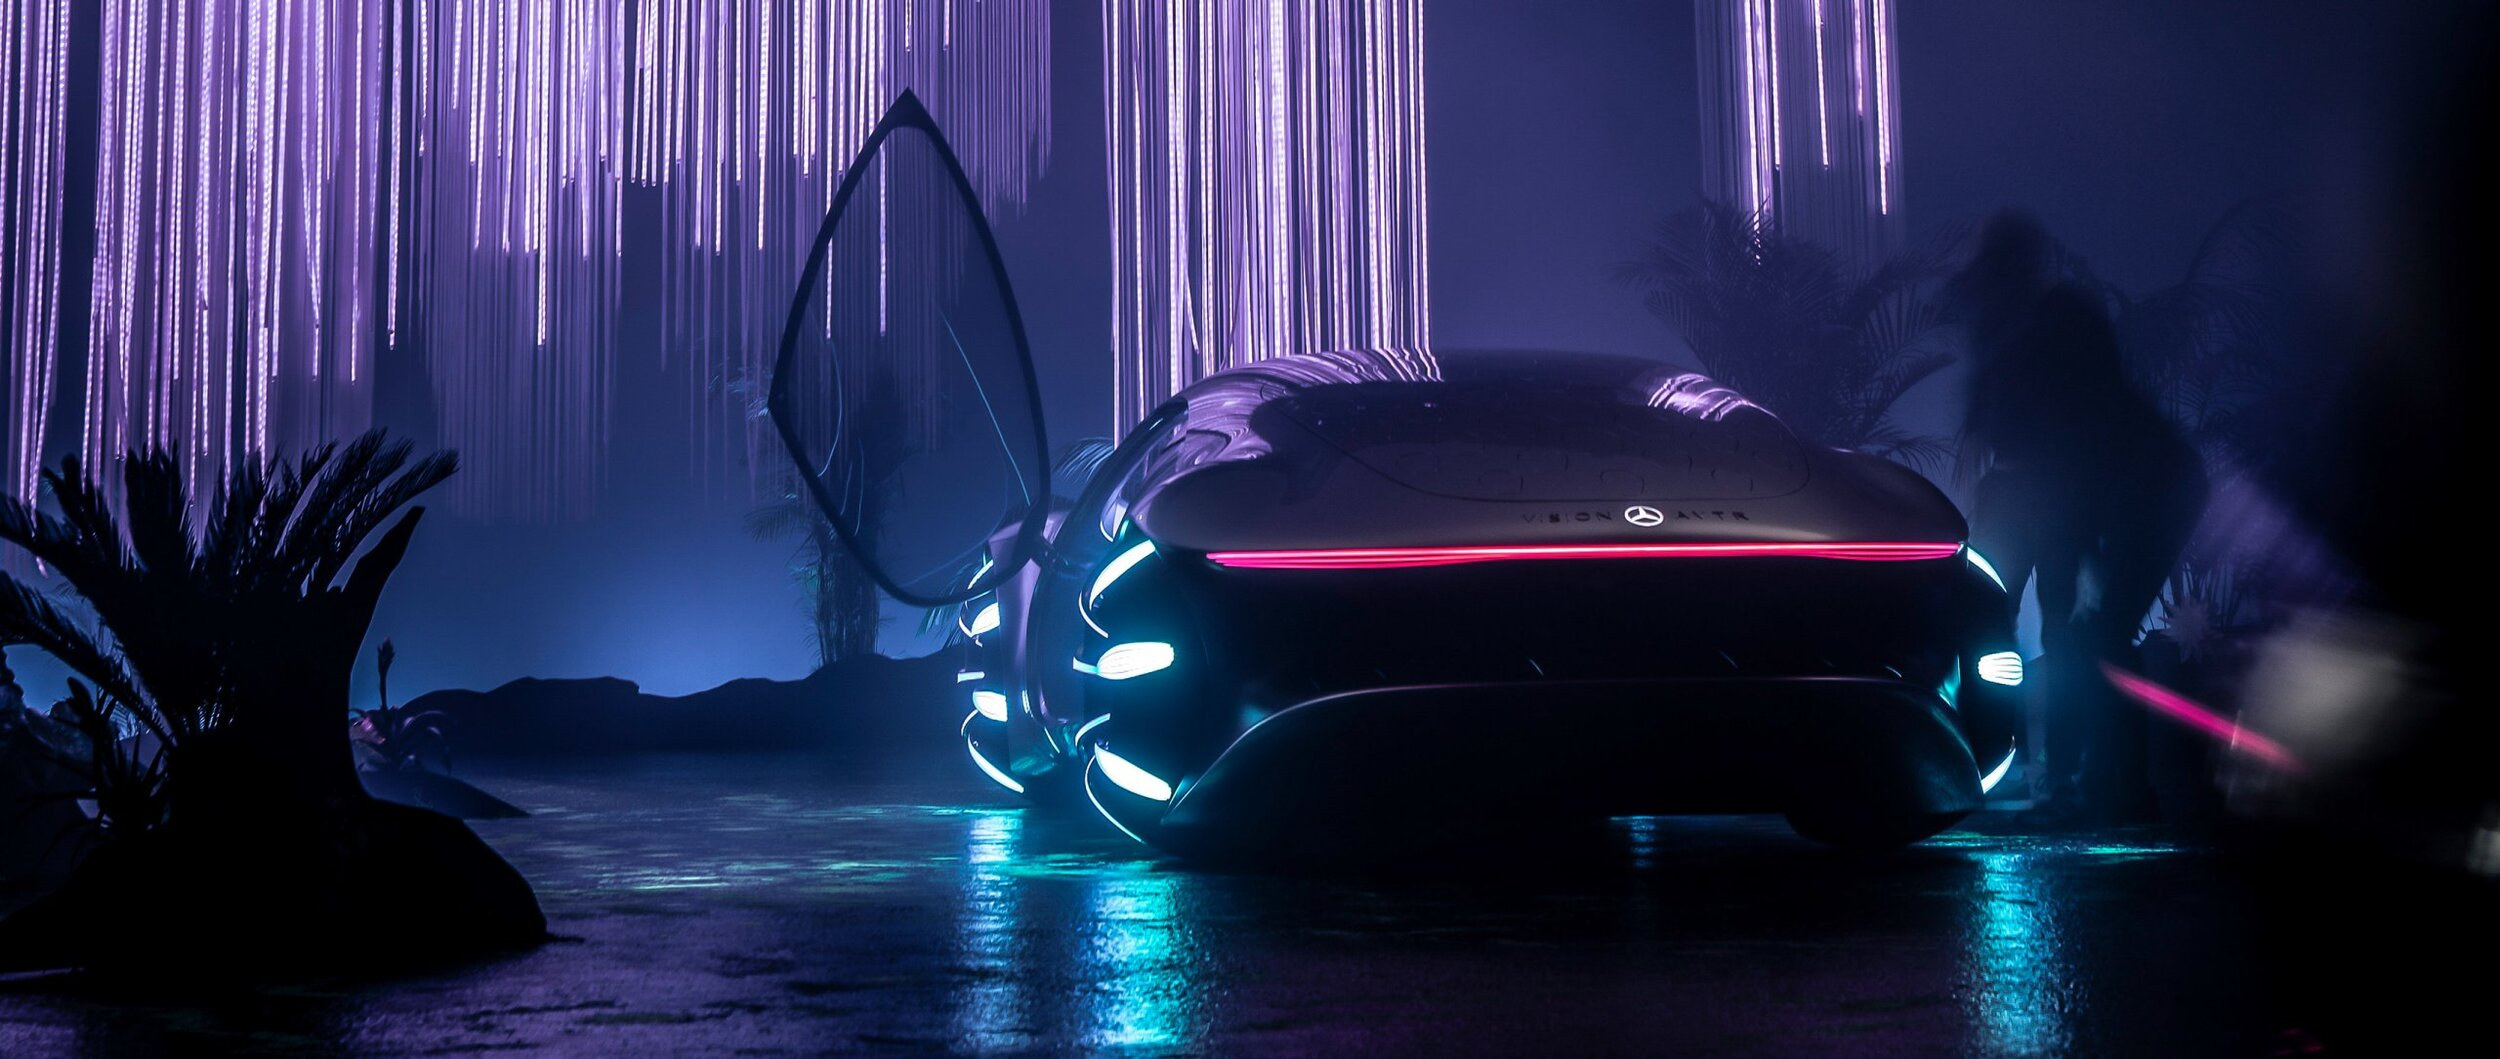 15-mercedes-benz-vehicles-concept-cars-vision-avtr-3400x1440.jpeg